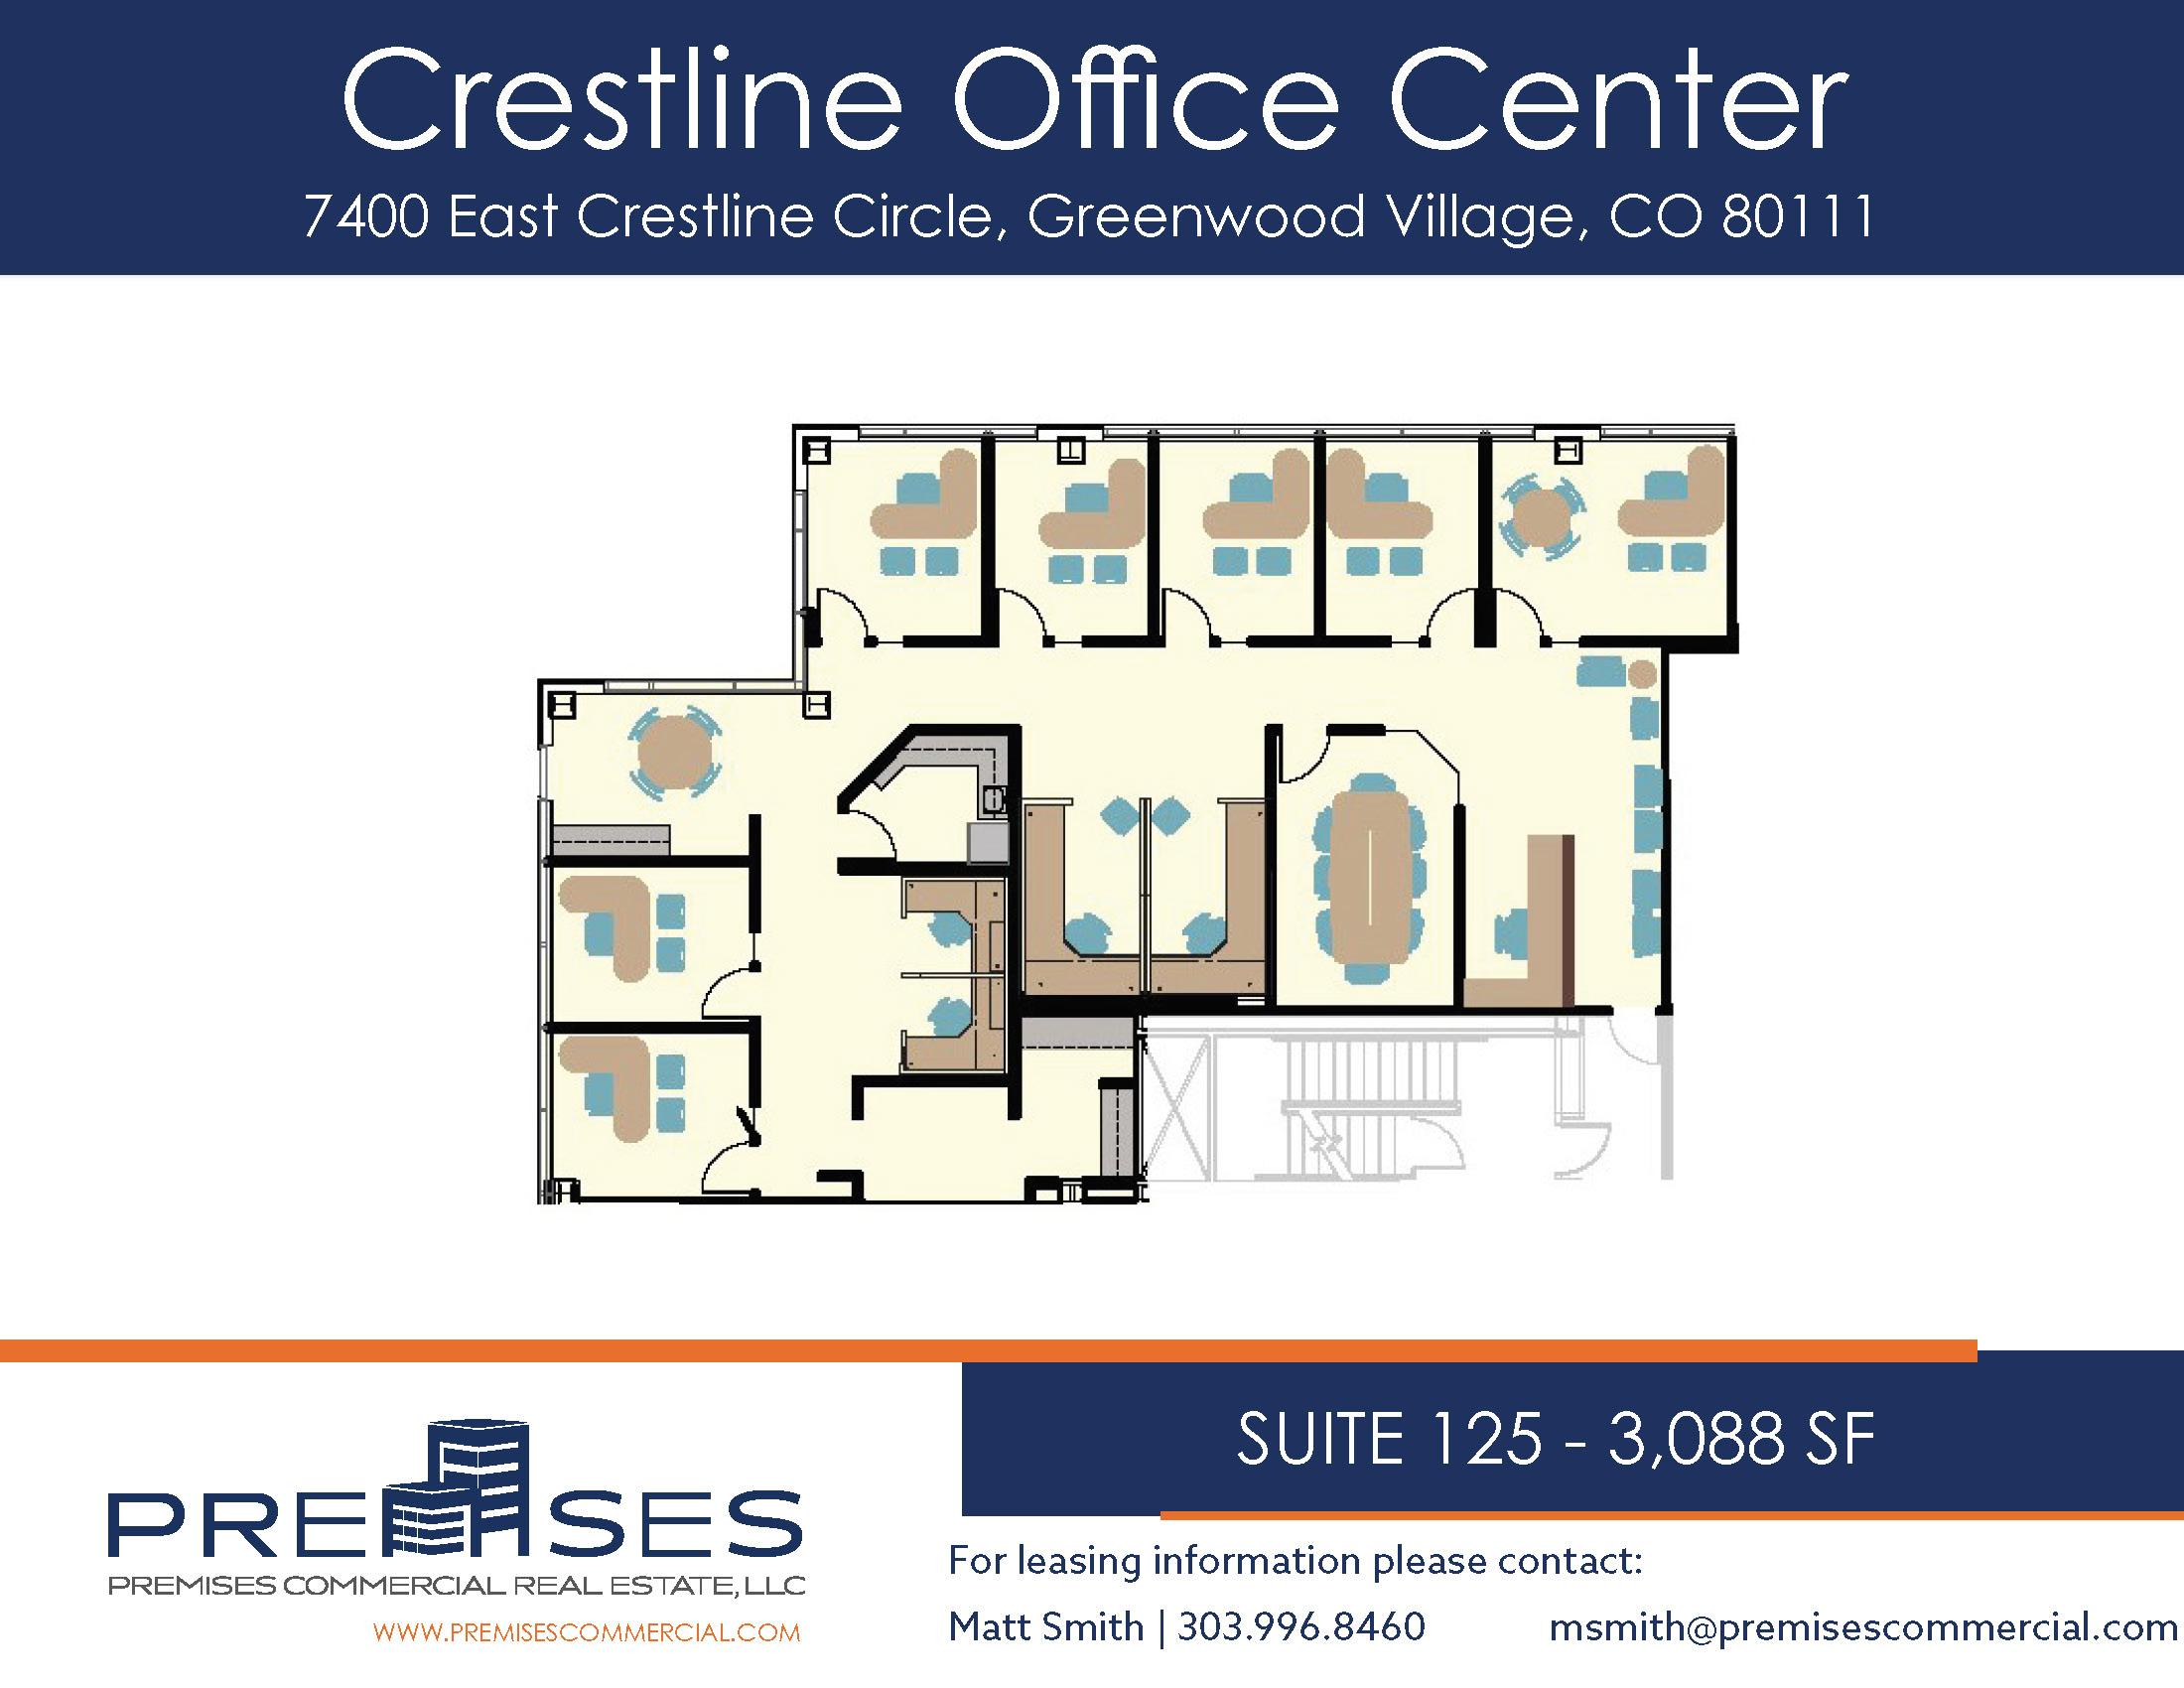 Suite 125 - 3,088 sf